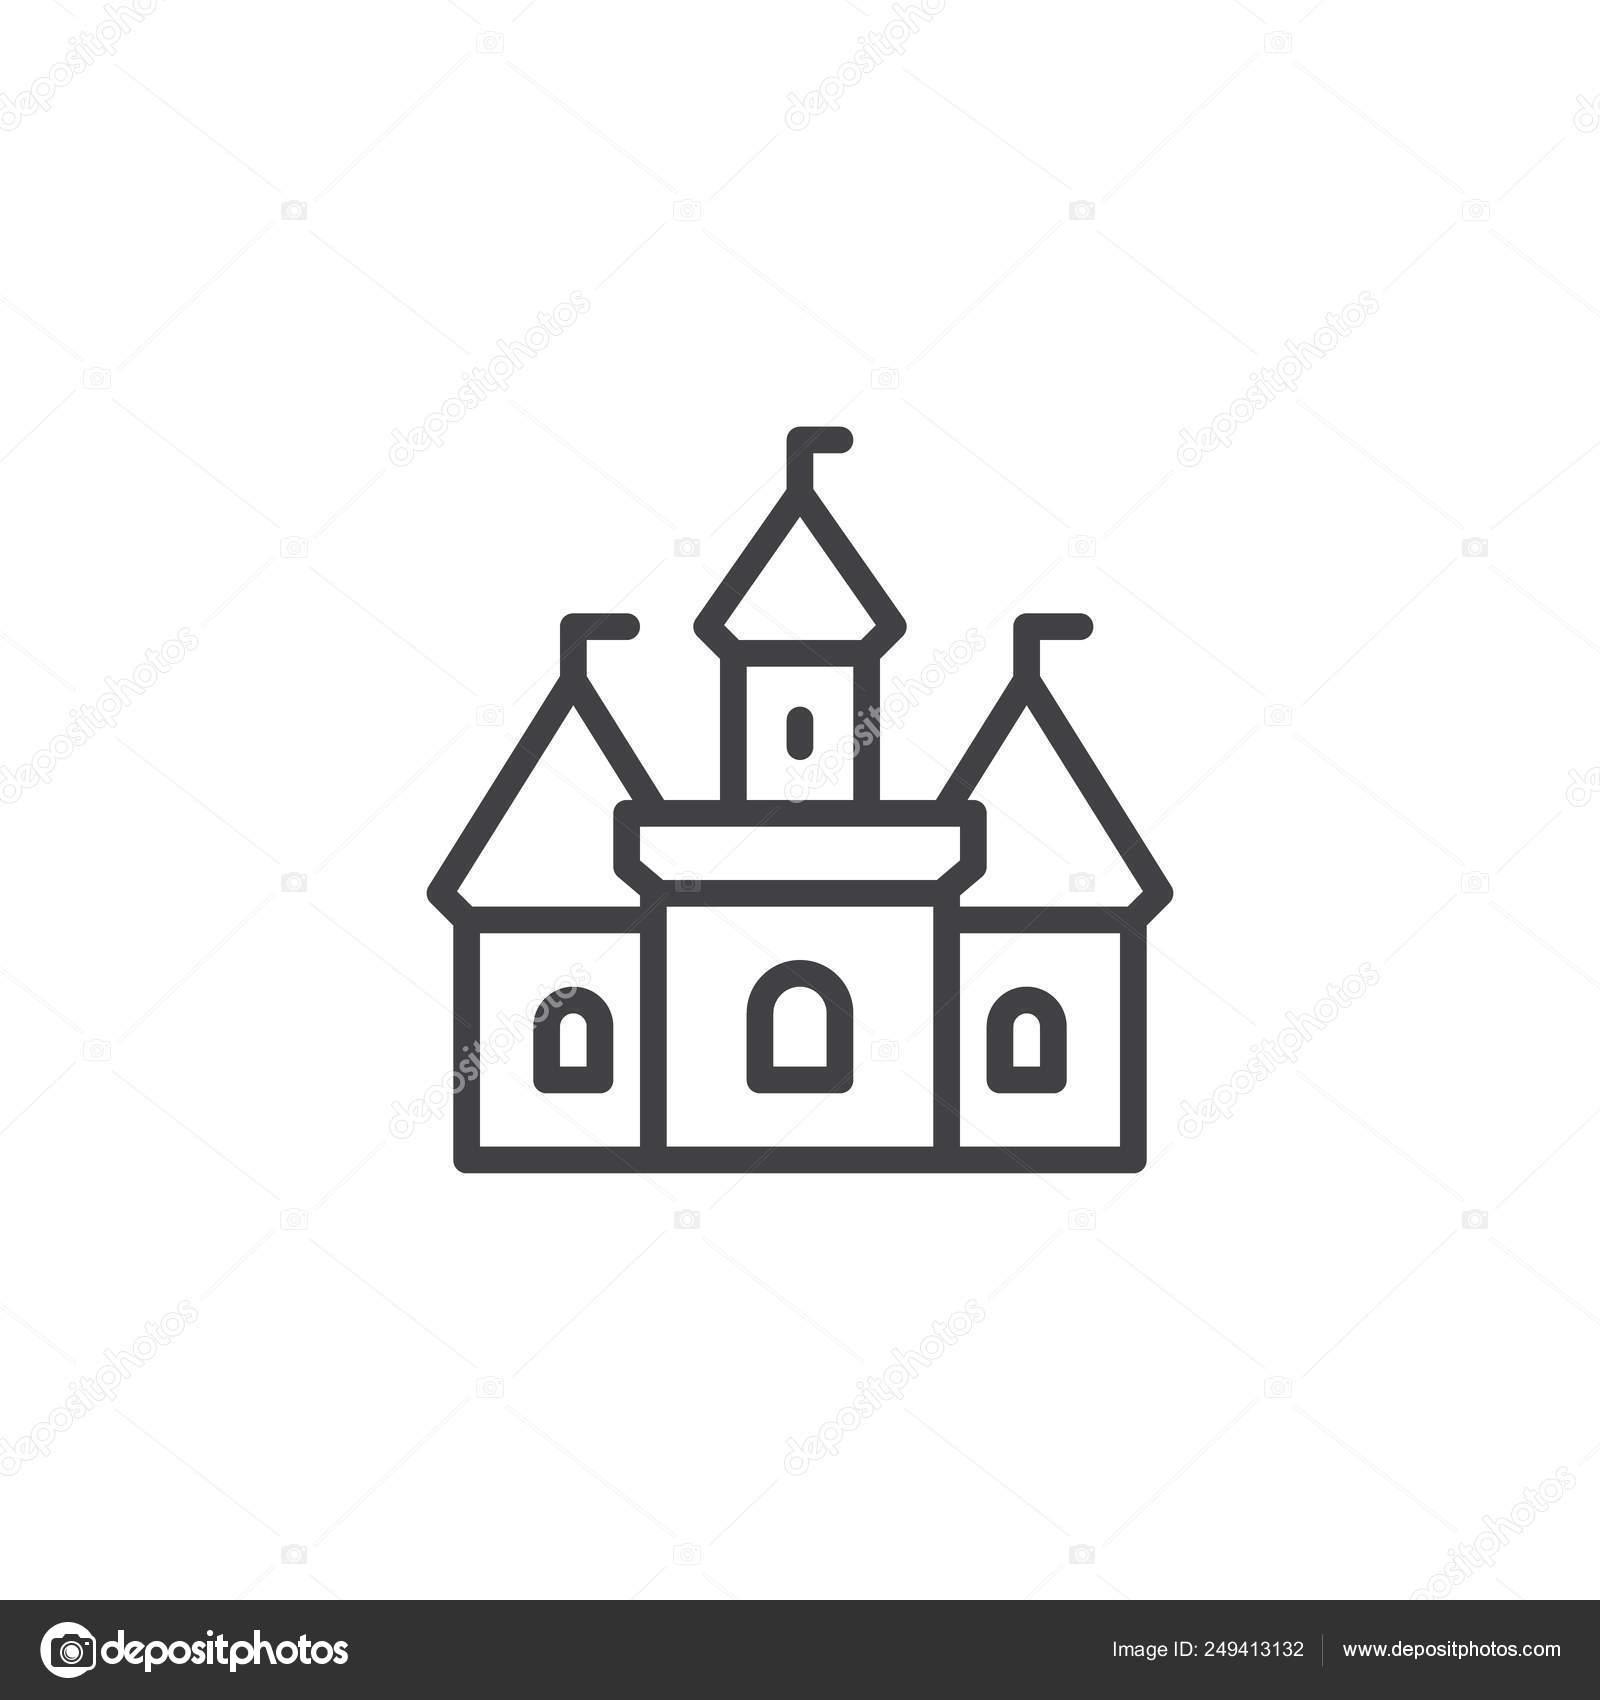 Castle Building Outline Icon Stock Vector C Avicons 249413132